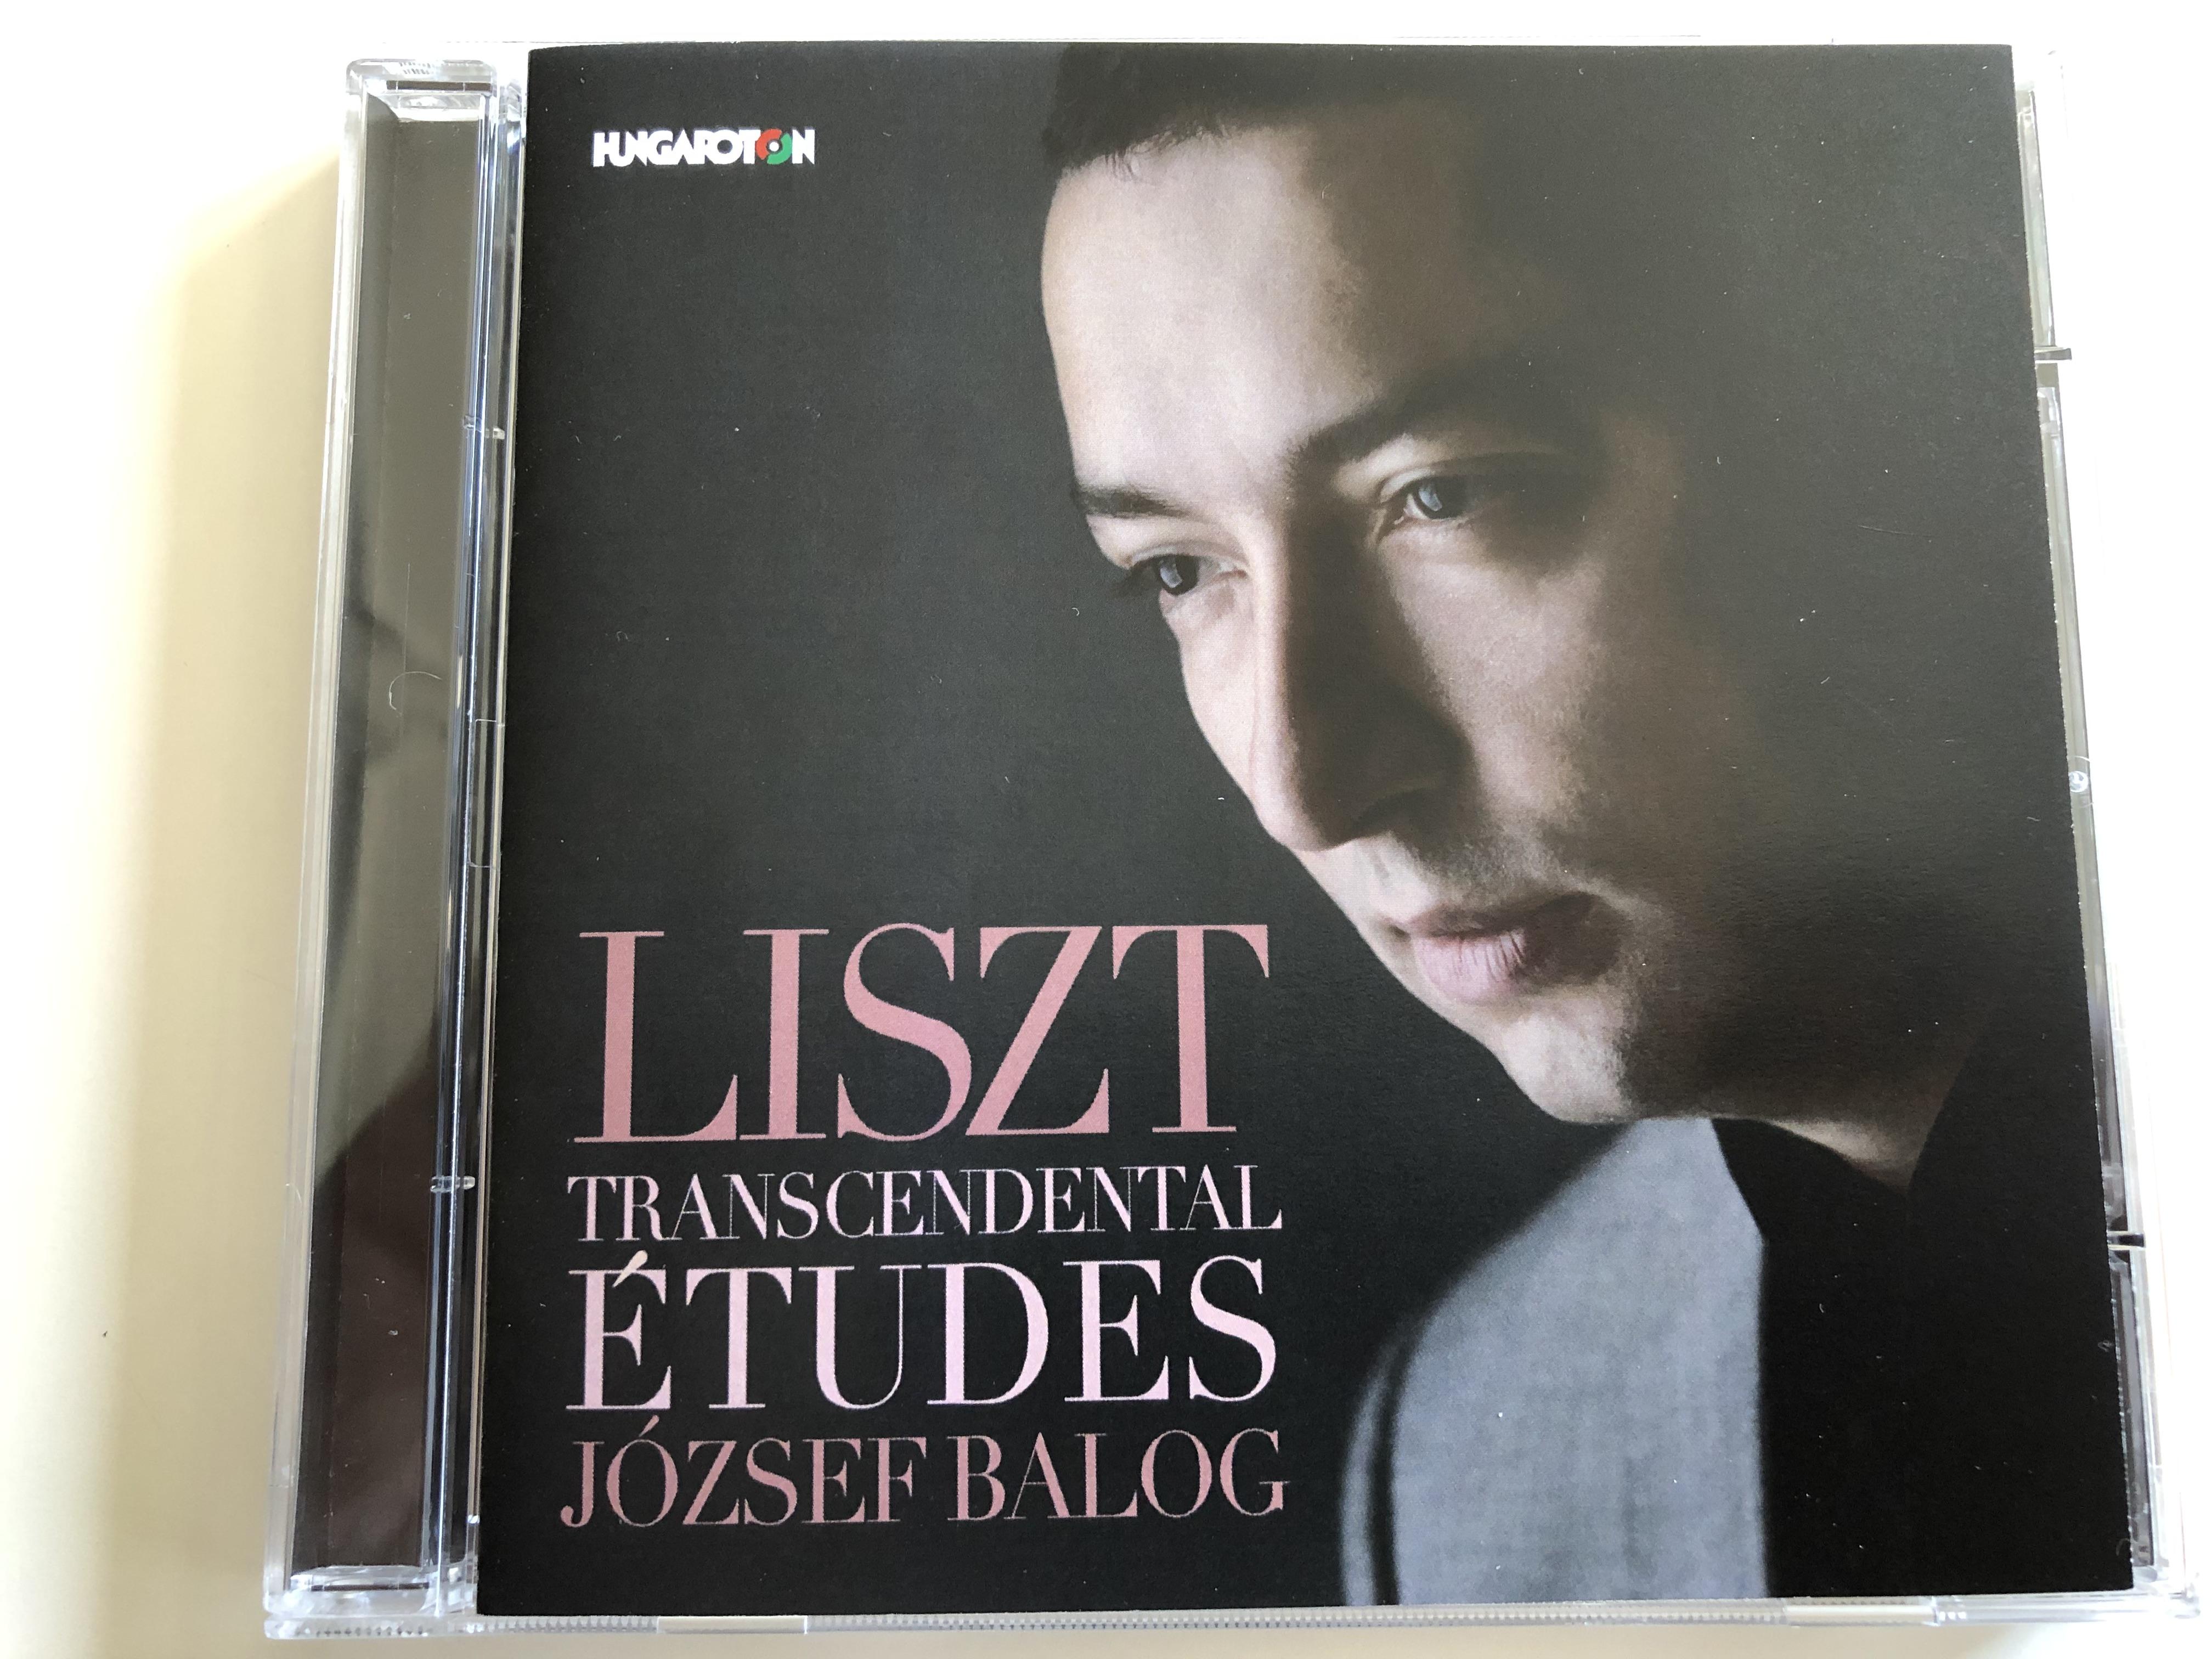 -liszt-transcendental-tudes-j-zsef-balog-piano-audio-cd-2014-hungaroton-hcd-32736-5991813273628-.jpg